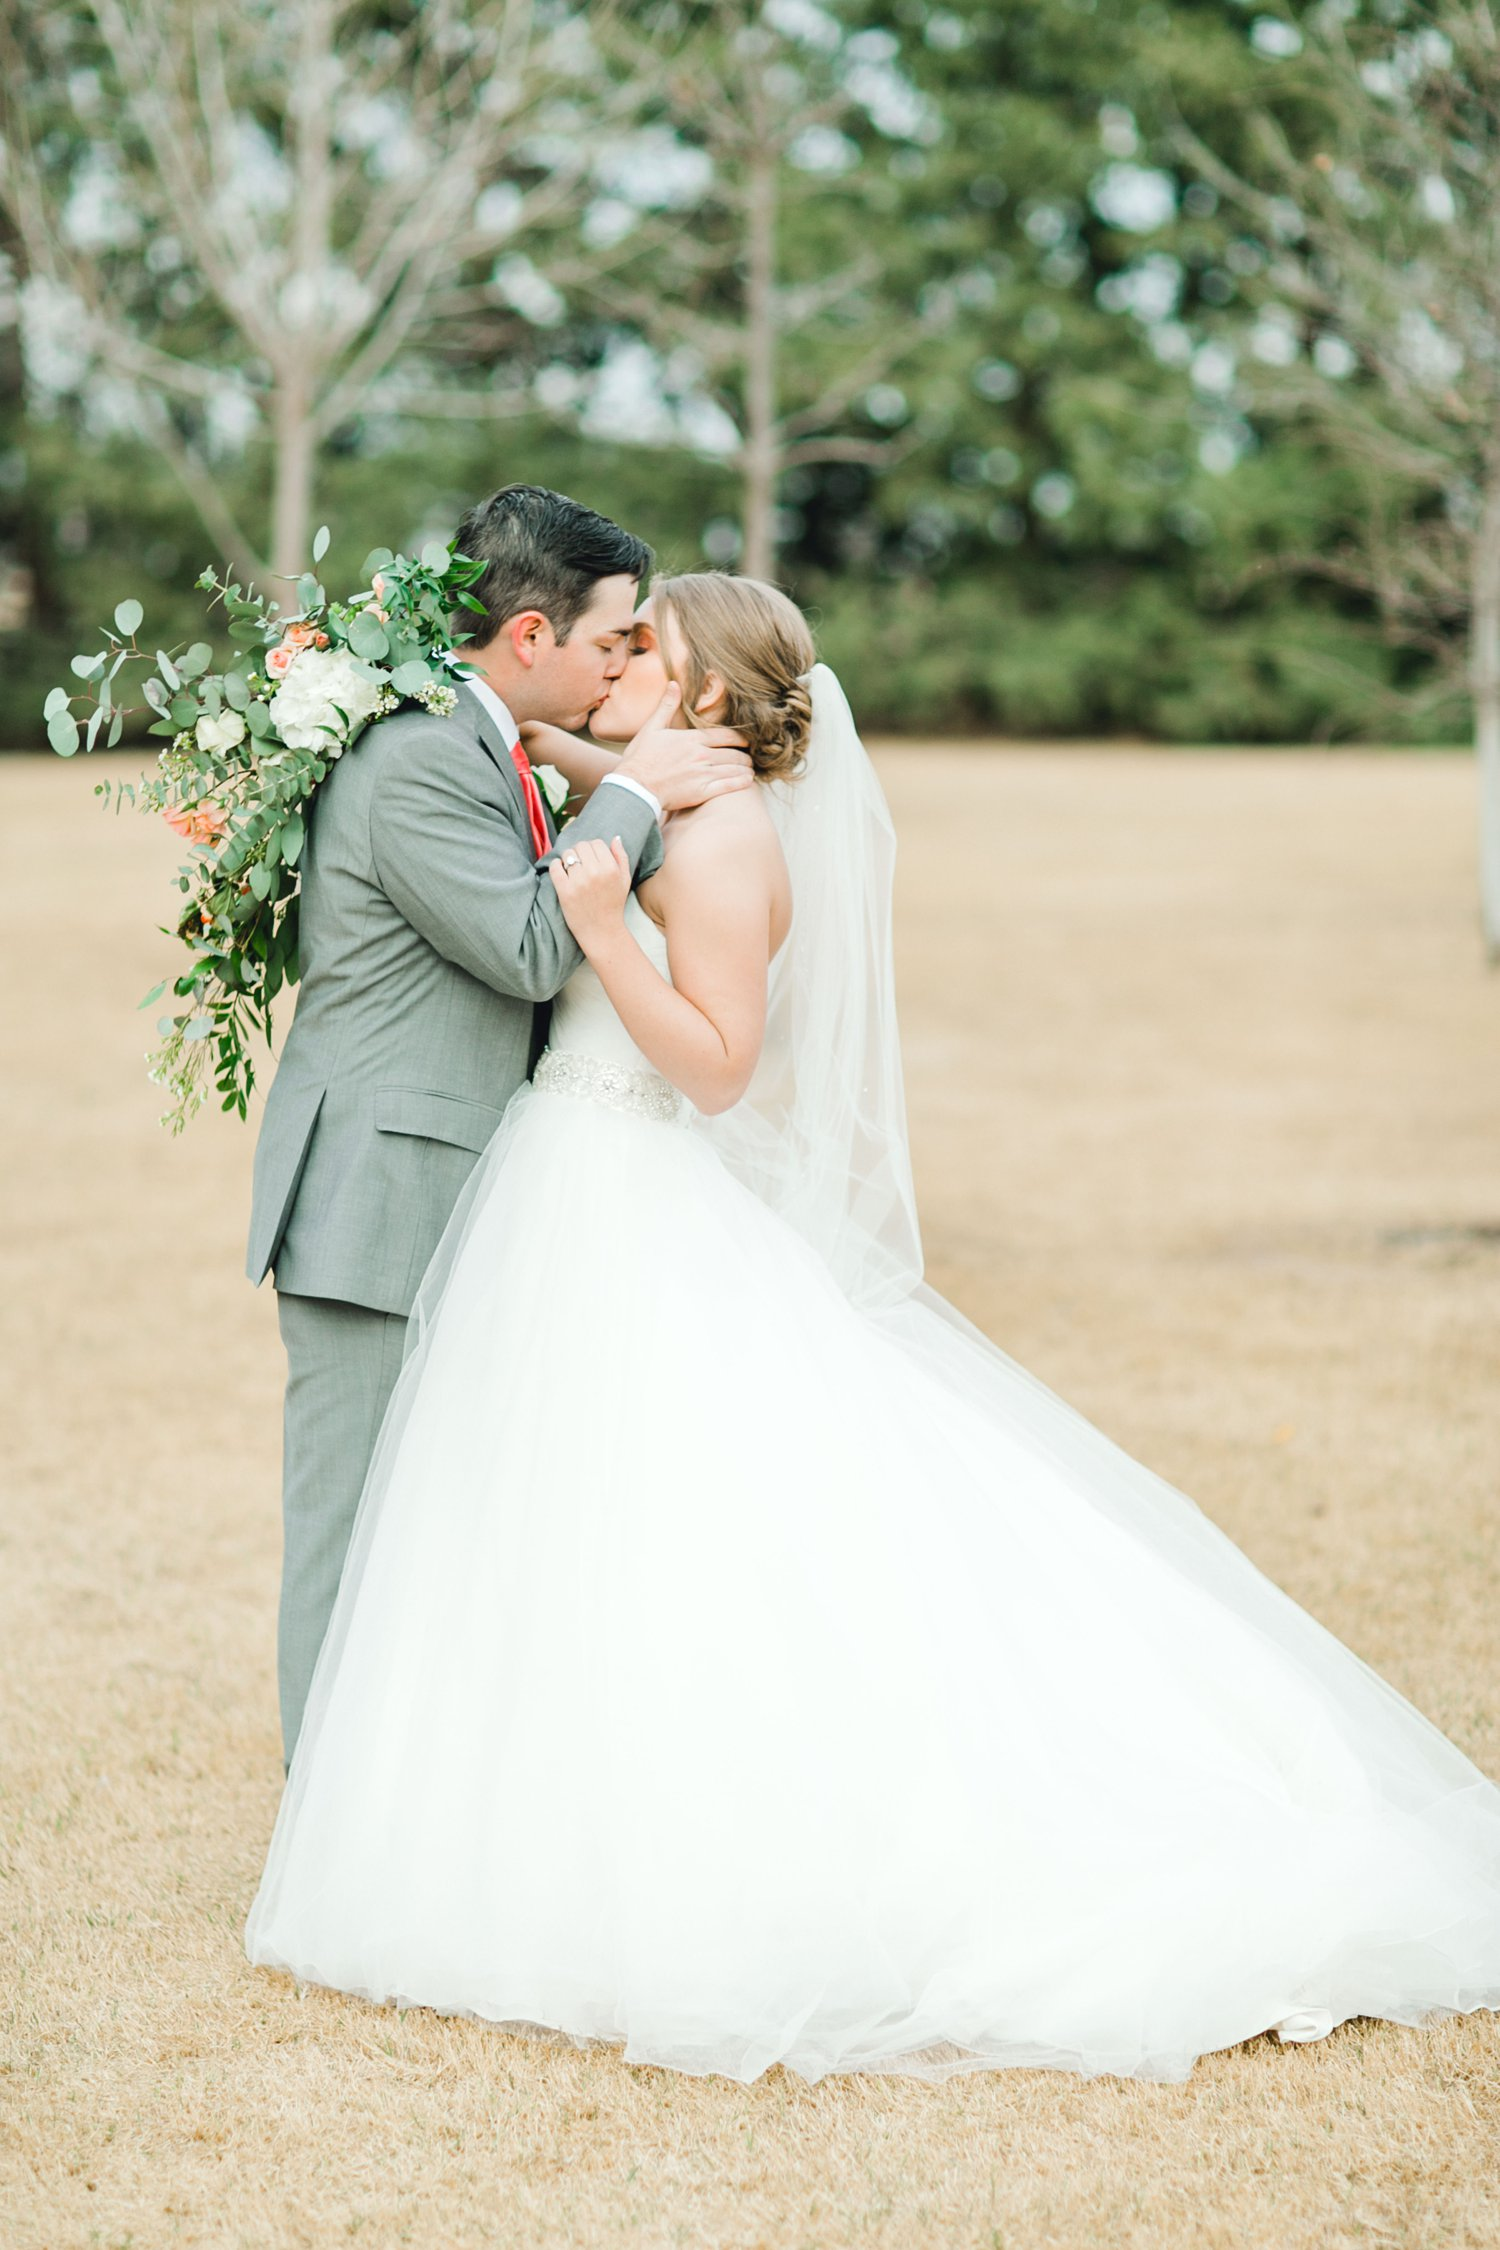 kayla-jacob-dow-cotton-creek-barn-lubbock-wedding-photographer-alleej0105.jpg